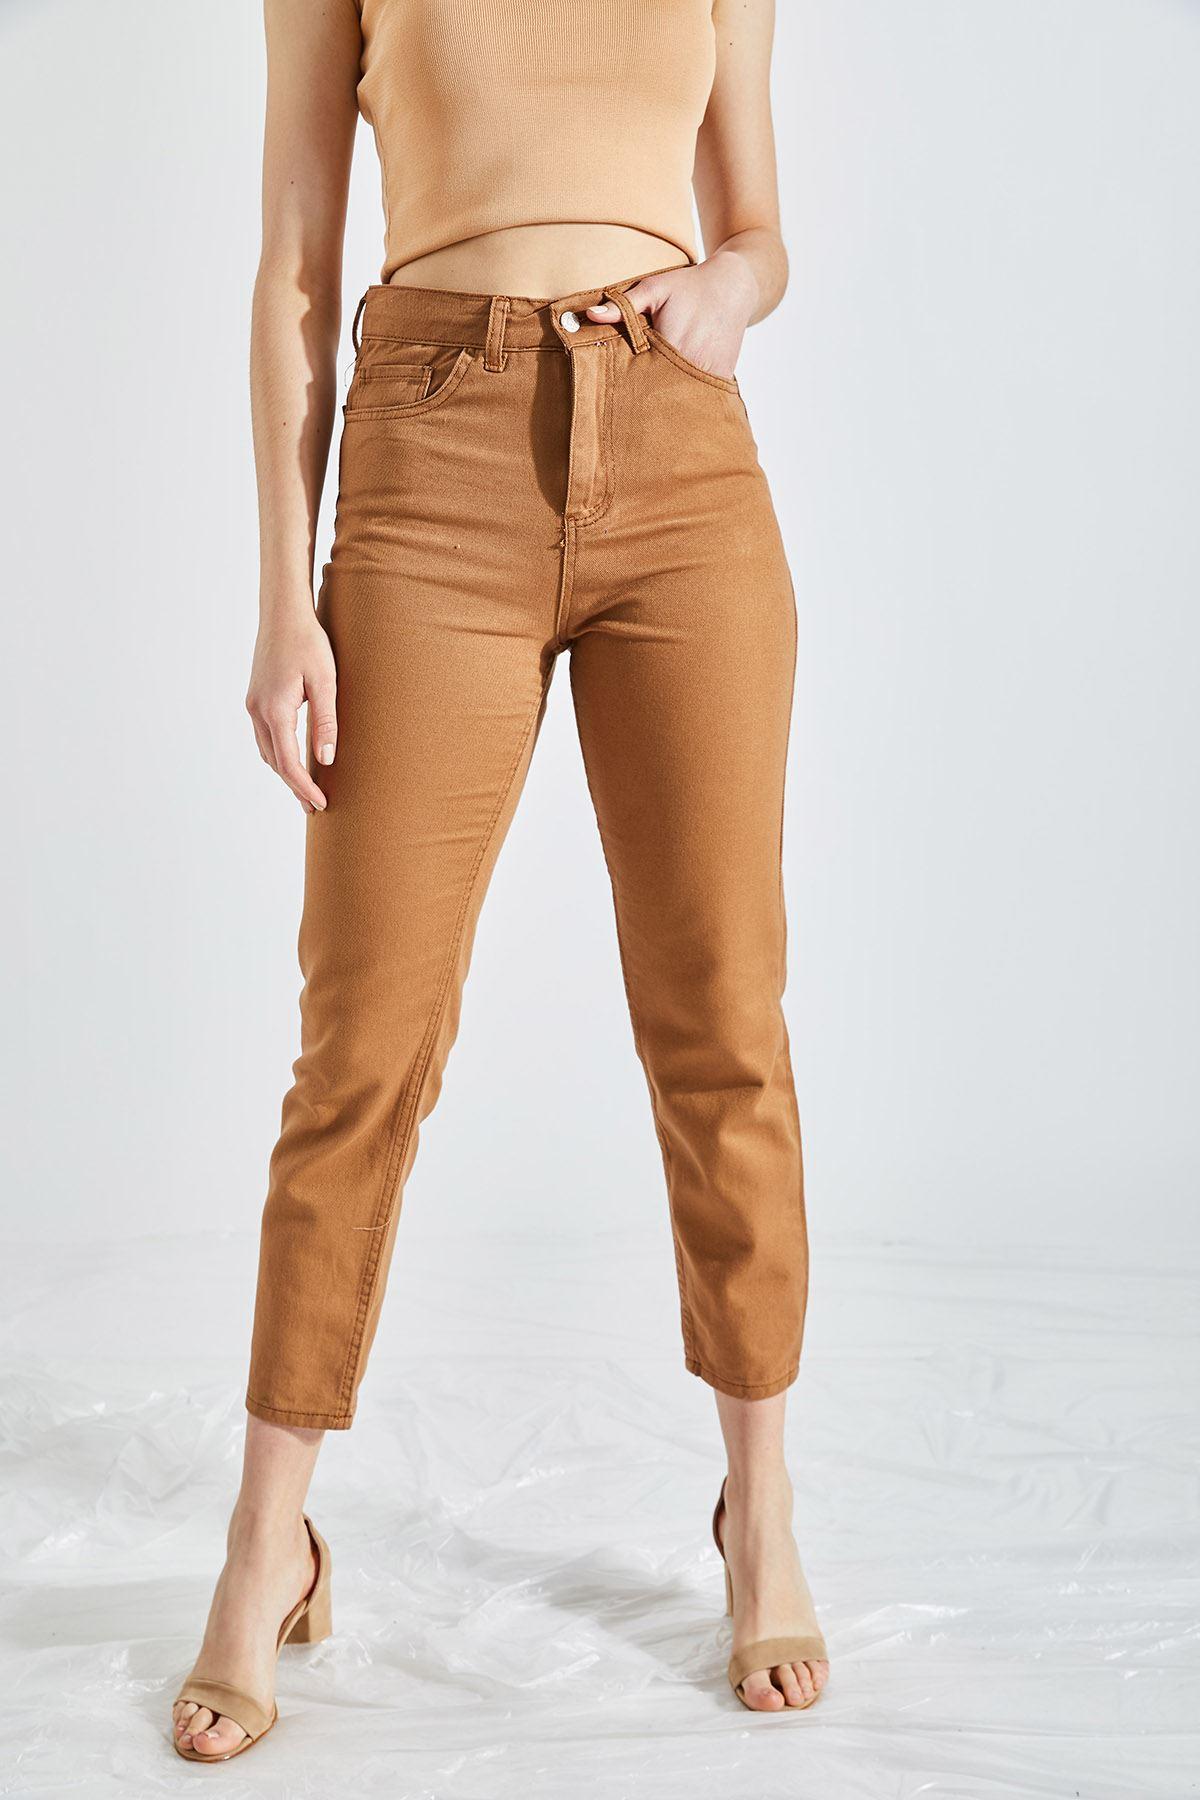 Kadın Boyfriend Kahverengi Kot Pantolon